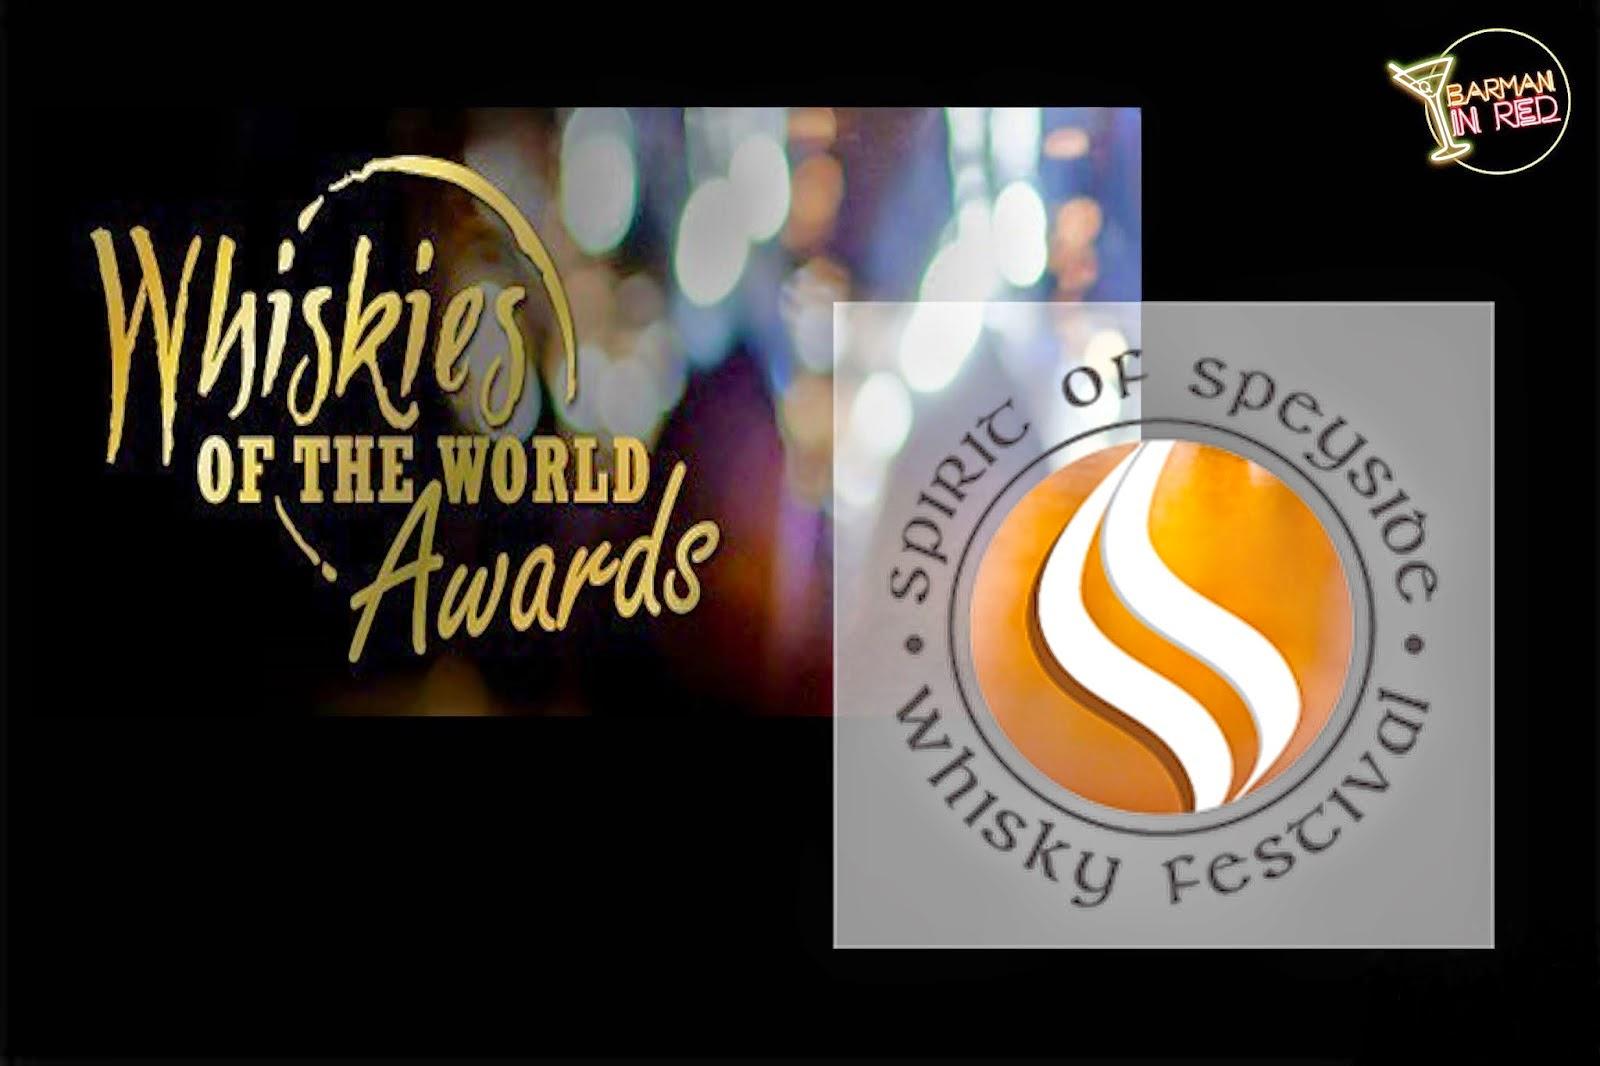 festivales de whisky